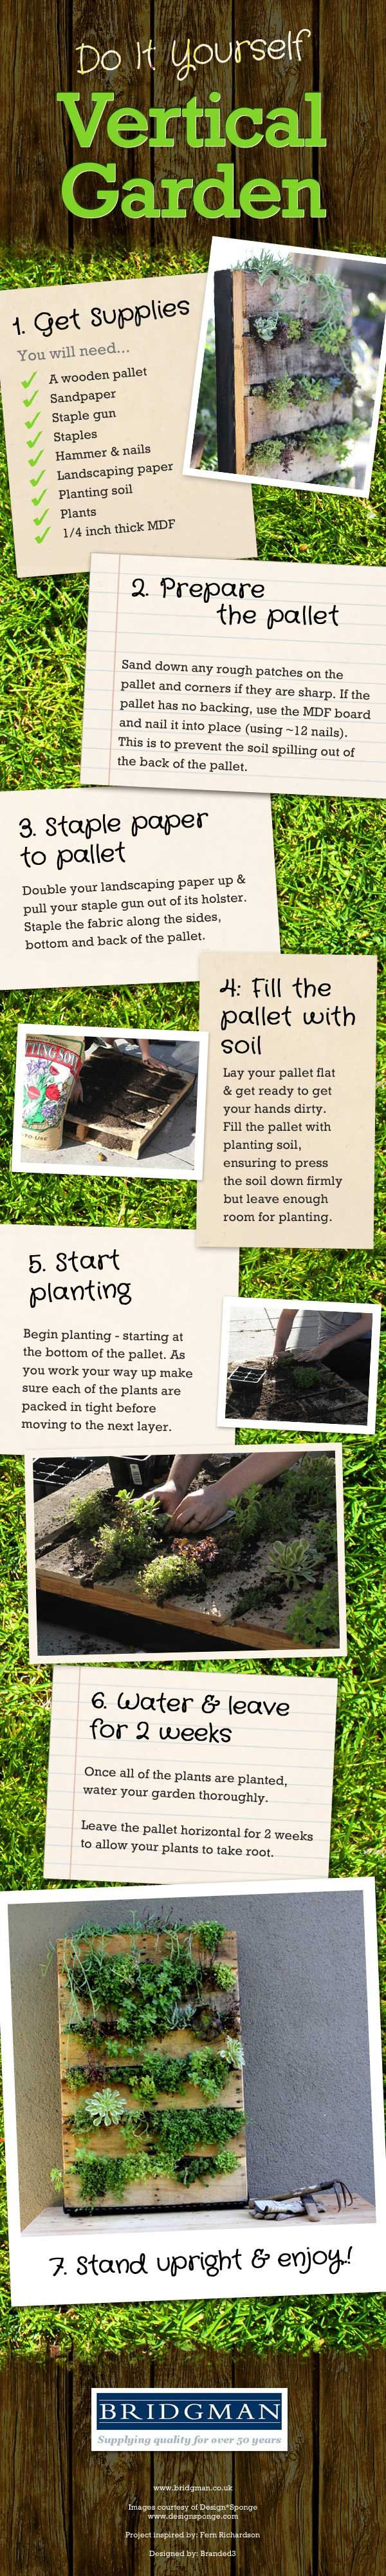 DIY Vertical Garden Wall. Best instructions yet!